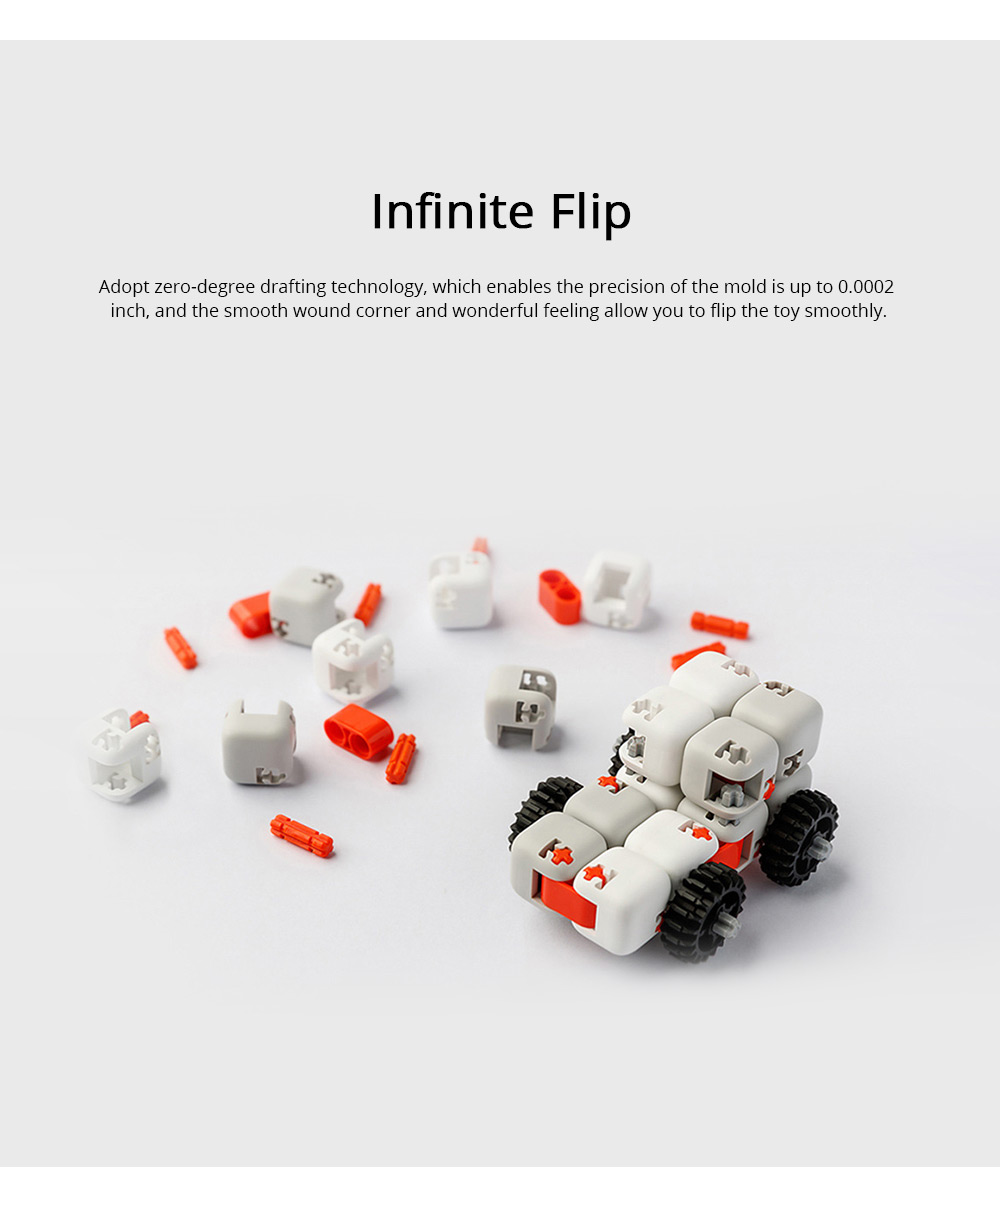 Xiaomi Portable Building Blocks Inspirational Magic Cube ABS Non-toxic Educational Toys for Children Brain Development 2